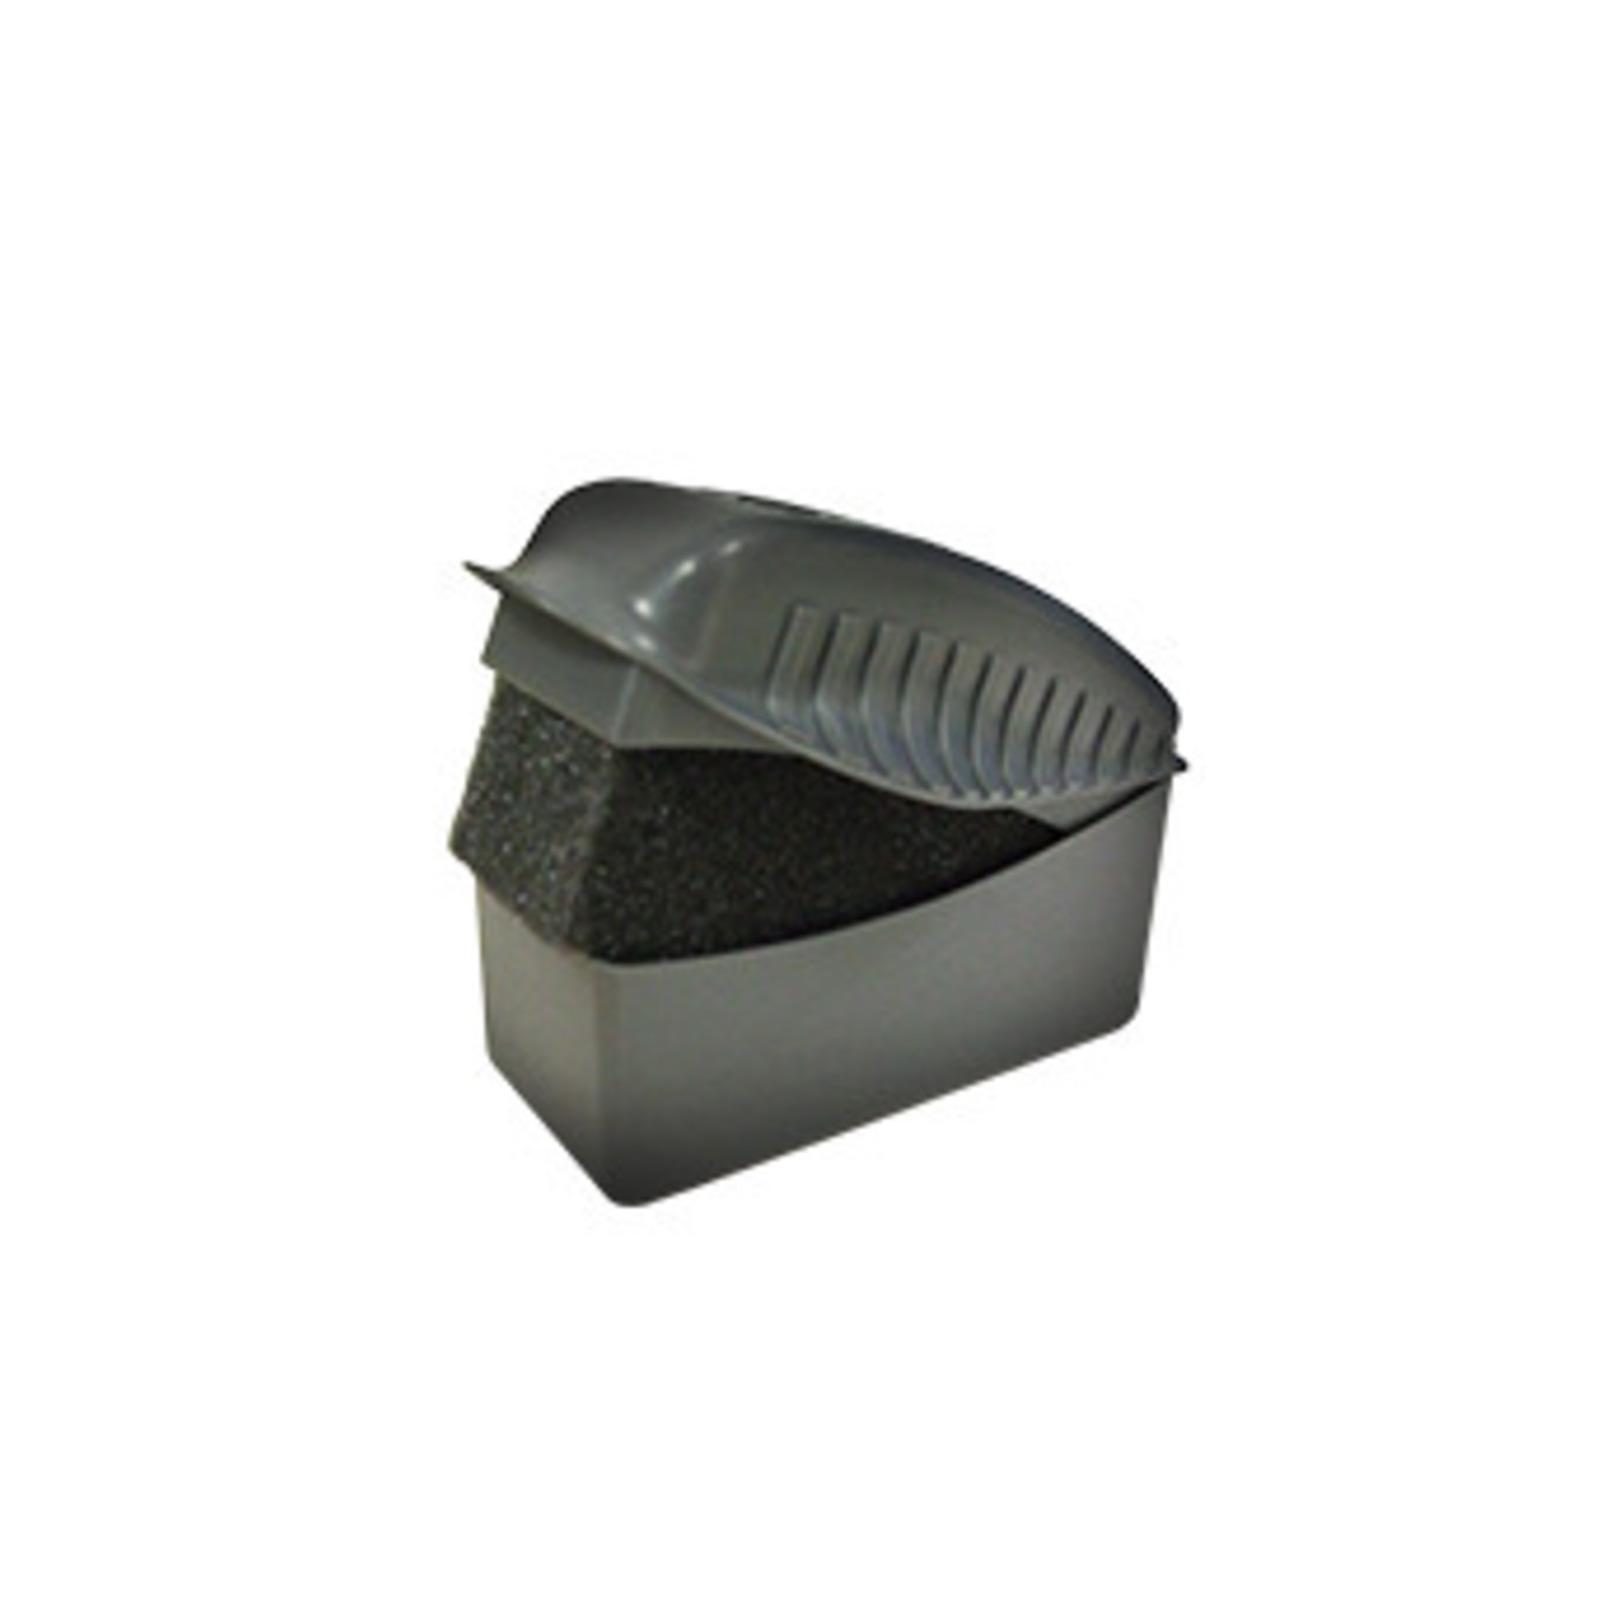 Meguiars Tire Dressing Applicator Pad Schwamm